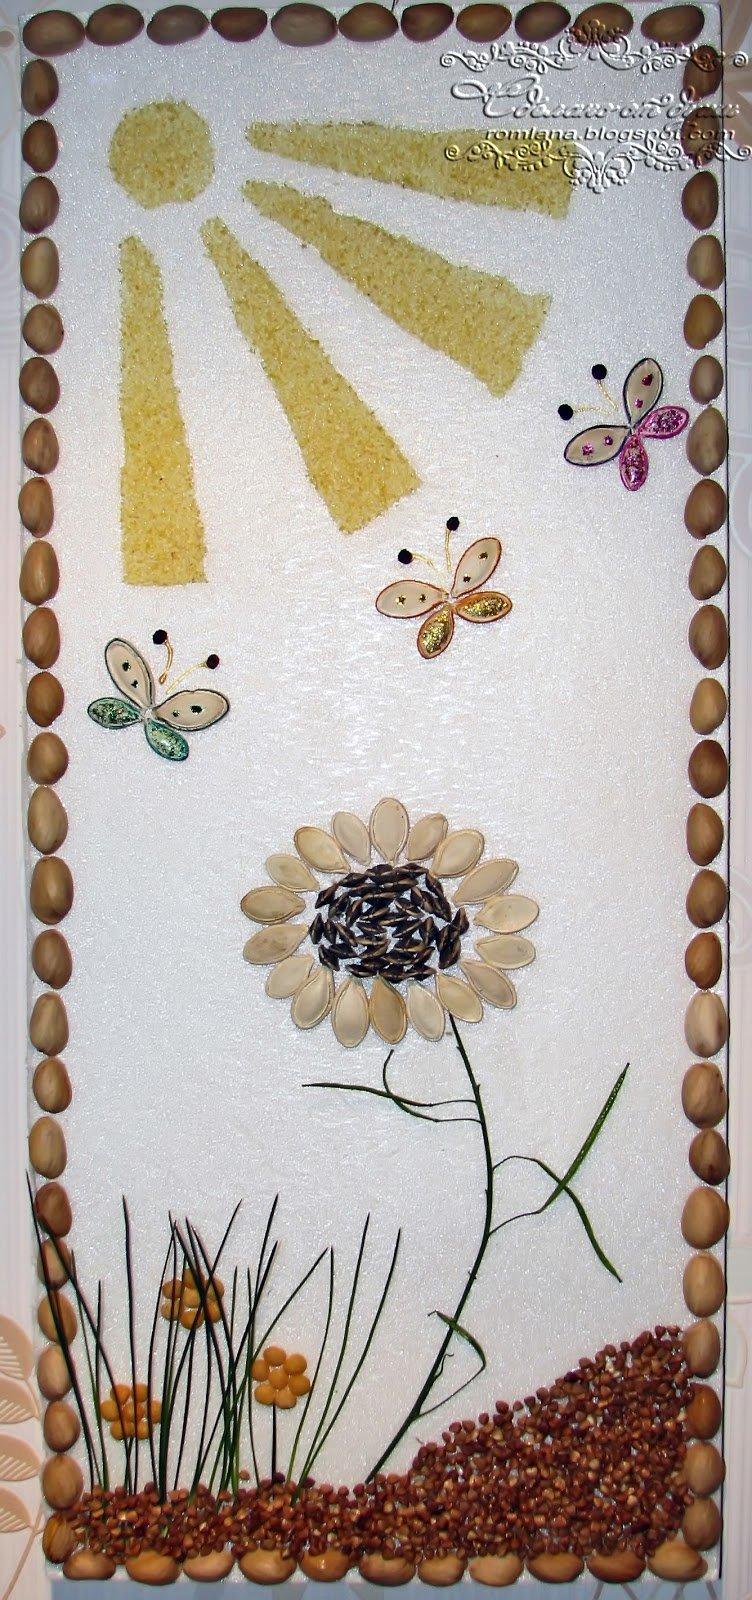 Картина поделка из крупы на тему осень